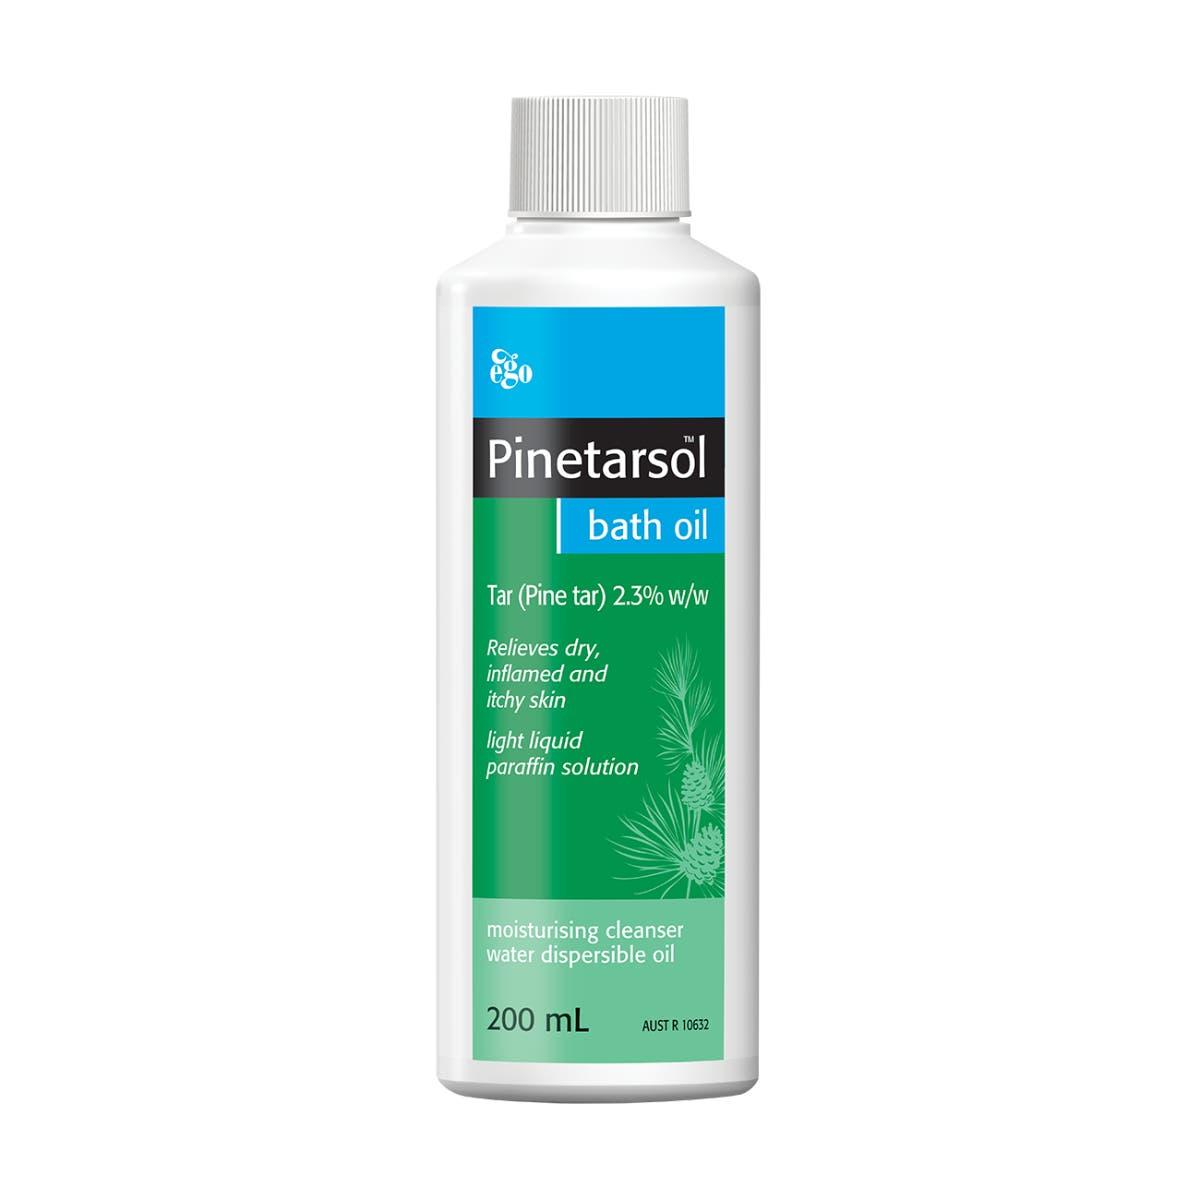 Pinetarsol Bath Oil 200mL